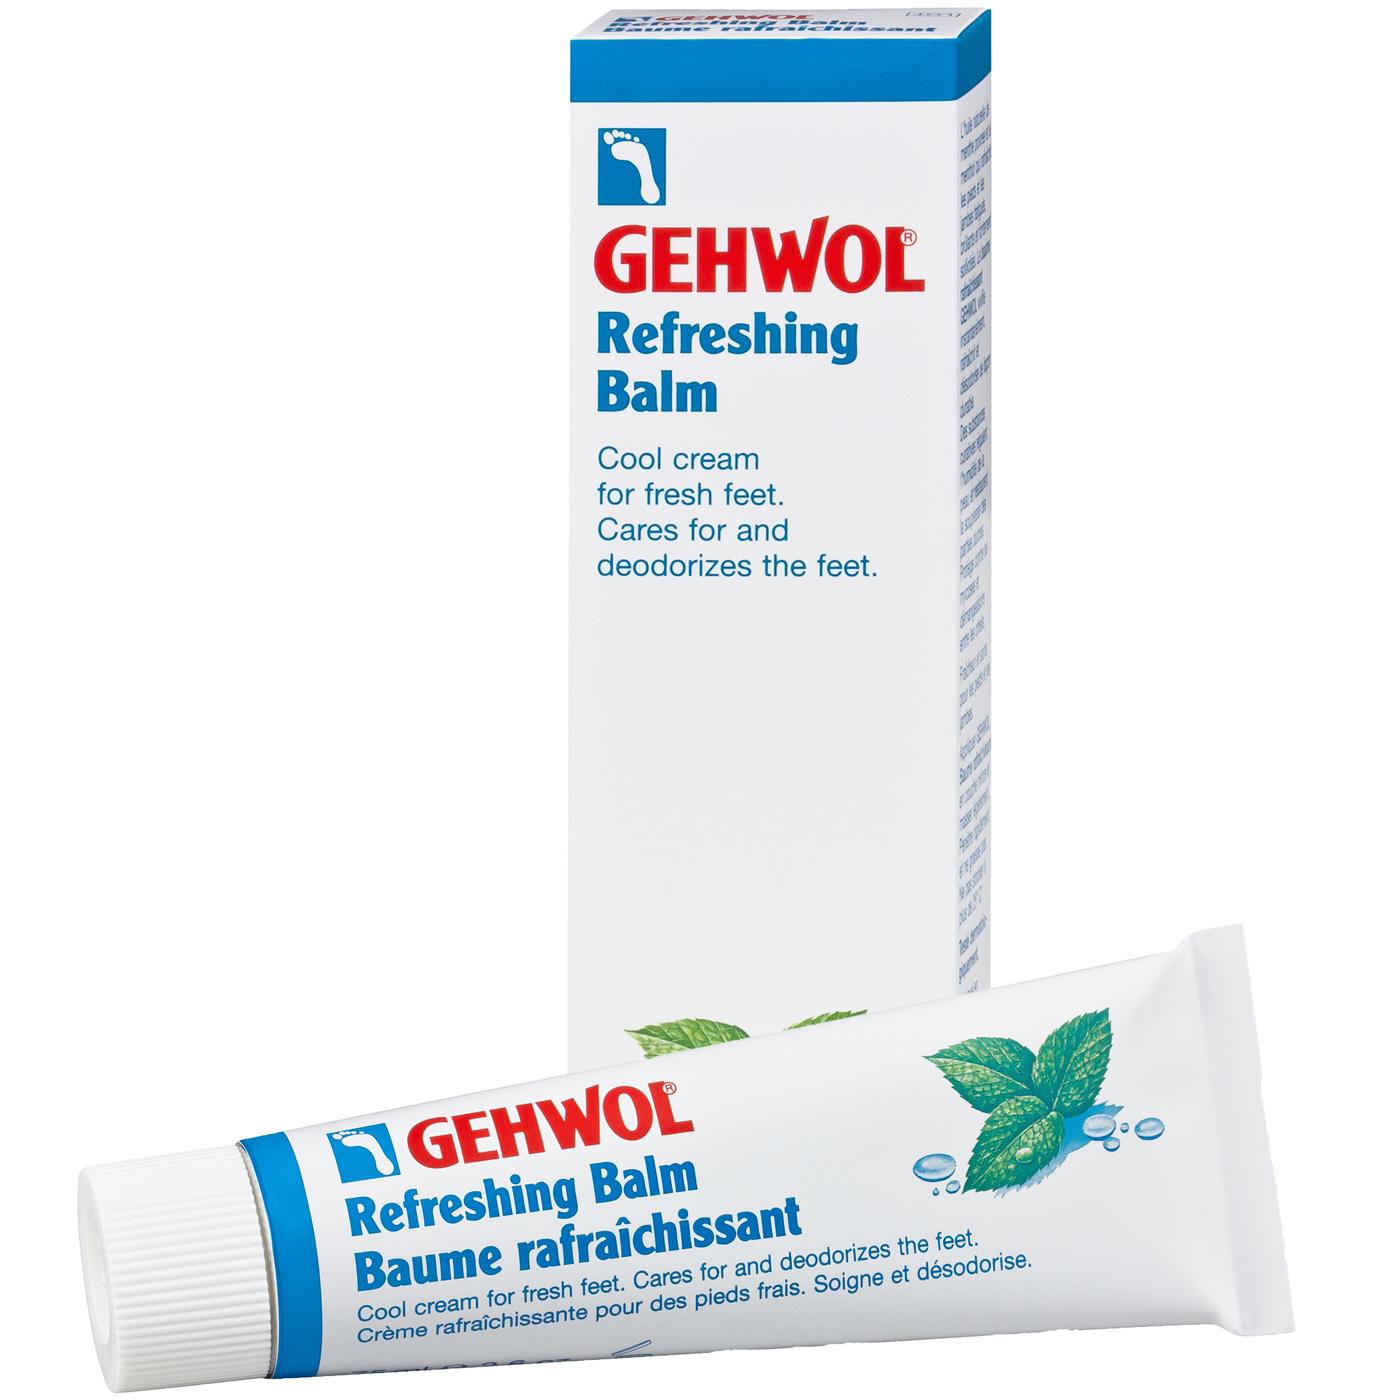 Gehwol Refreshing Balm Βάλσαμο Φρεσκάδας 75ml υγιεινή   πόδια   κακοσμία ποδιών